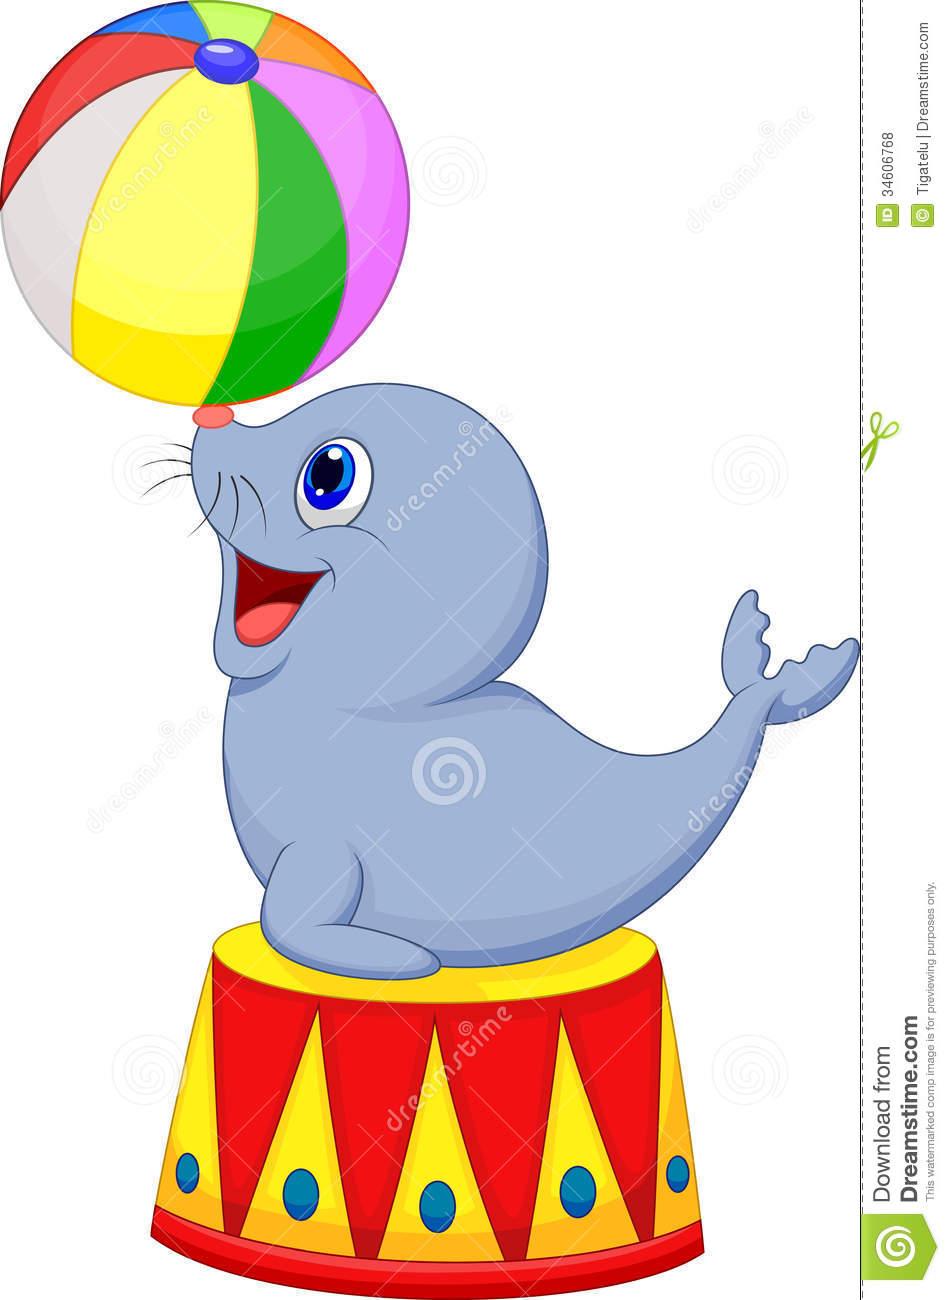 950x1300 Circus Cartoon Seal Playing A Ball